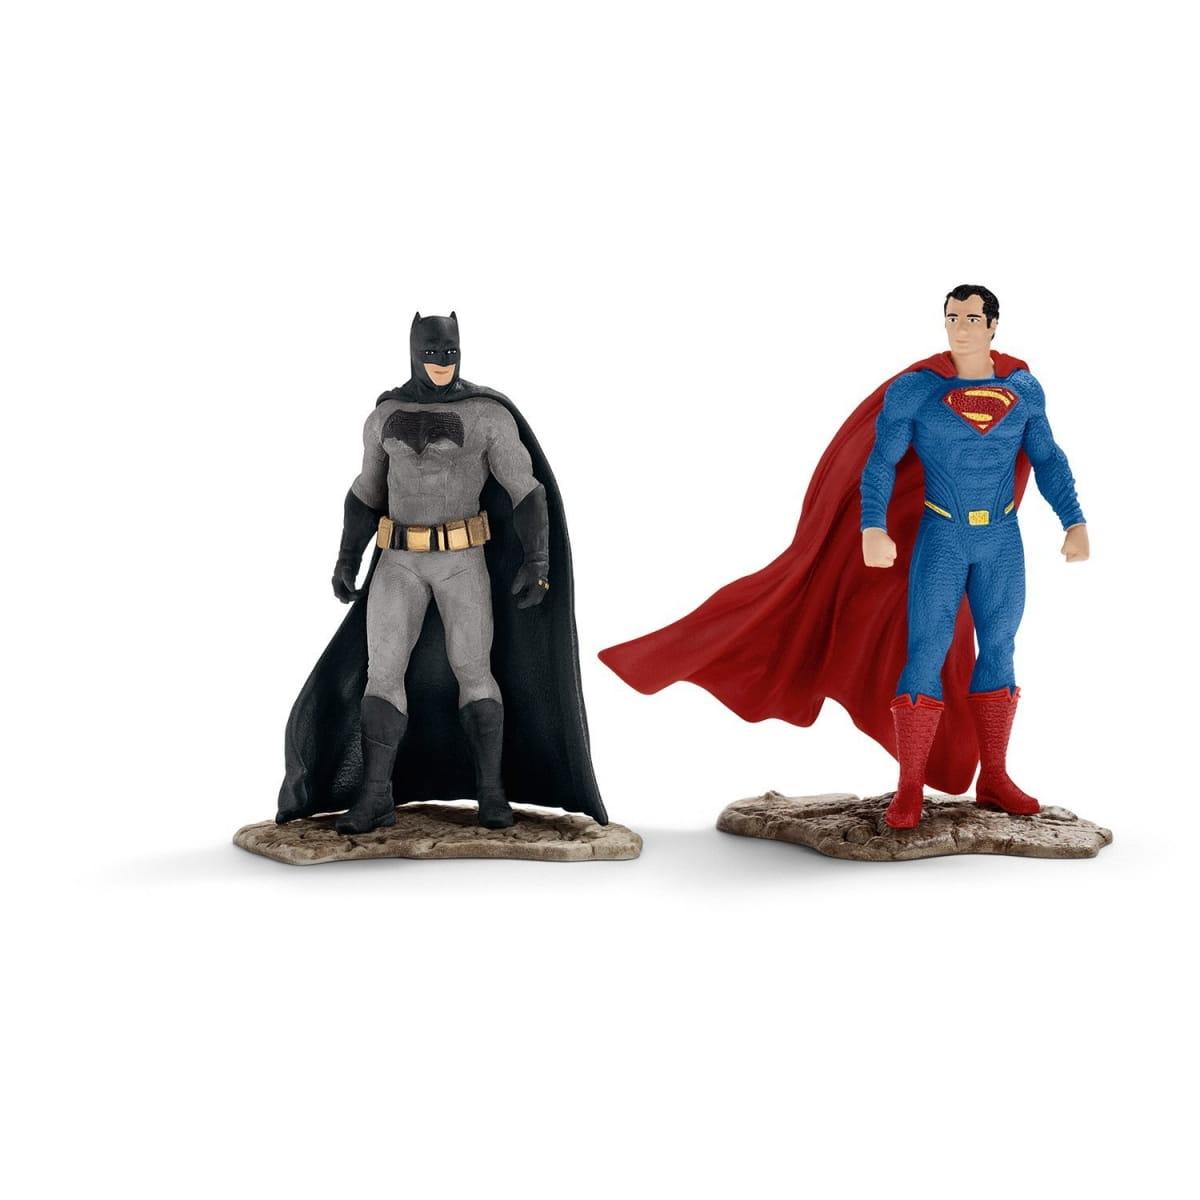 Набор фигурок Schleich 22529 Герой комиксов - Бэтмэн и Супермен